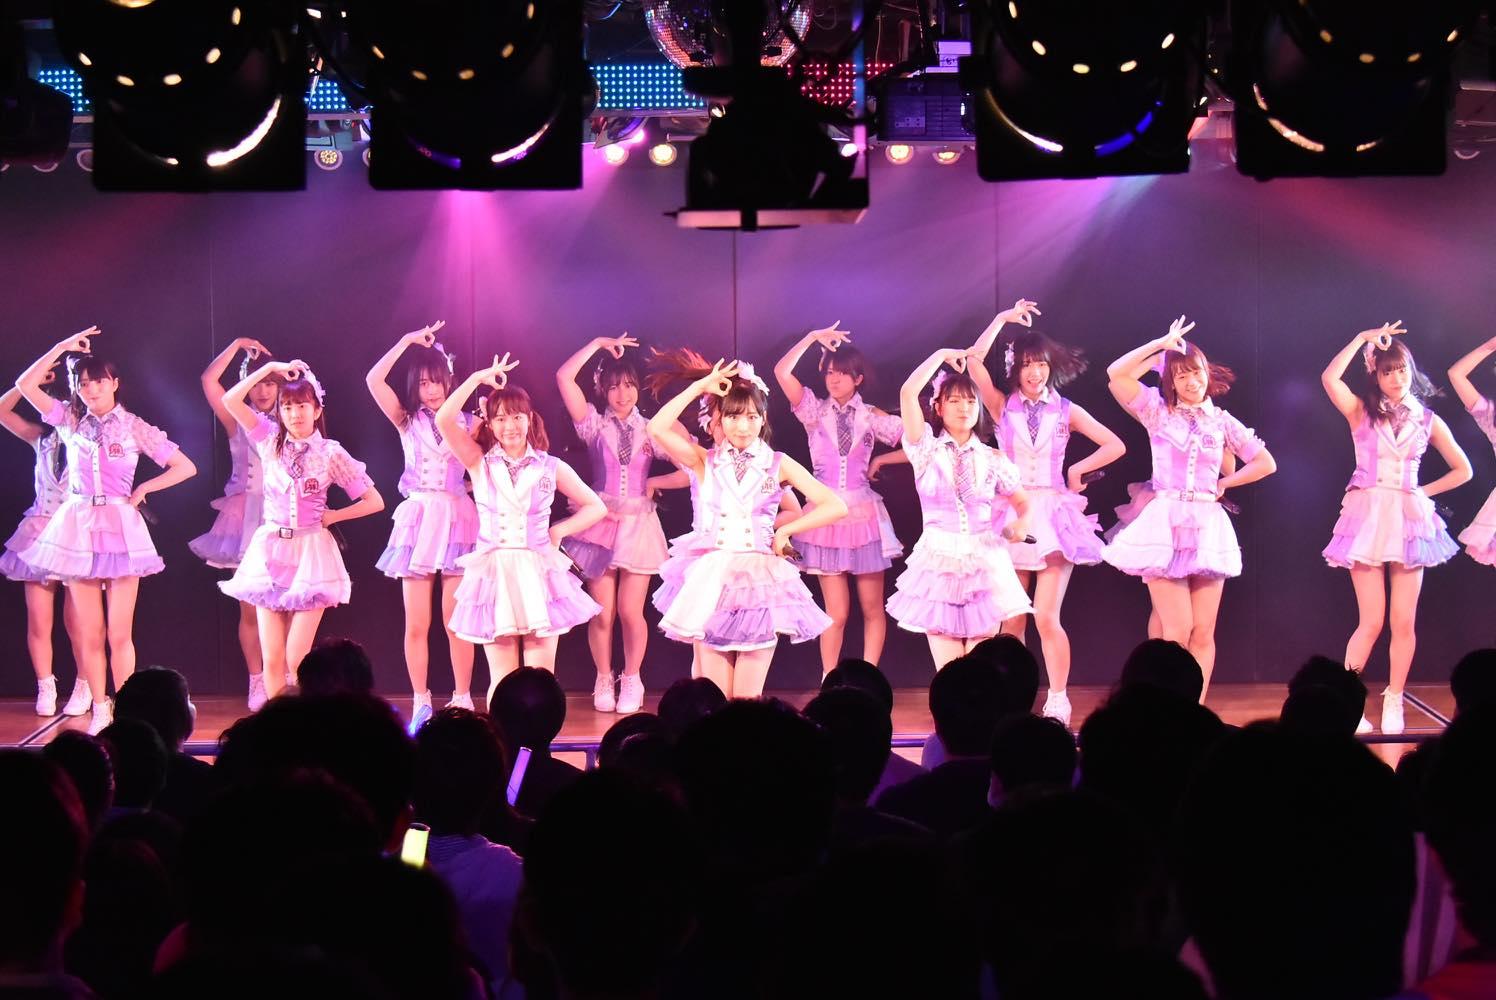 AKB48チーム8が新曲『好きだ 好きだ 好きだ』を初披露、全国ツアーの⽇程も発表【写真6枚】の画像003